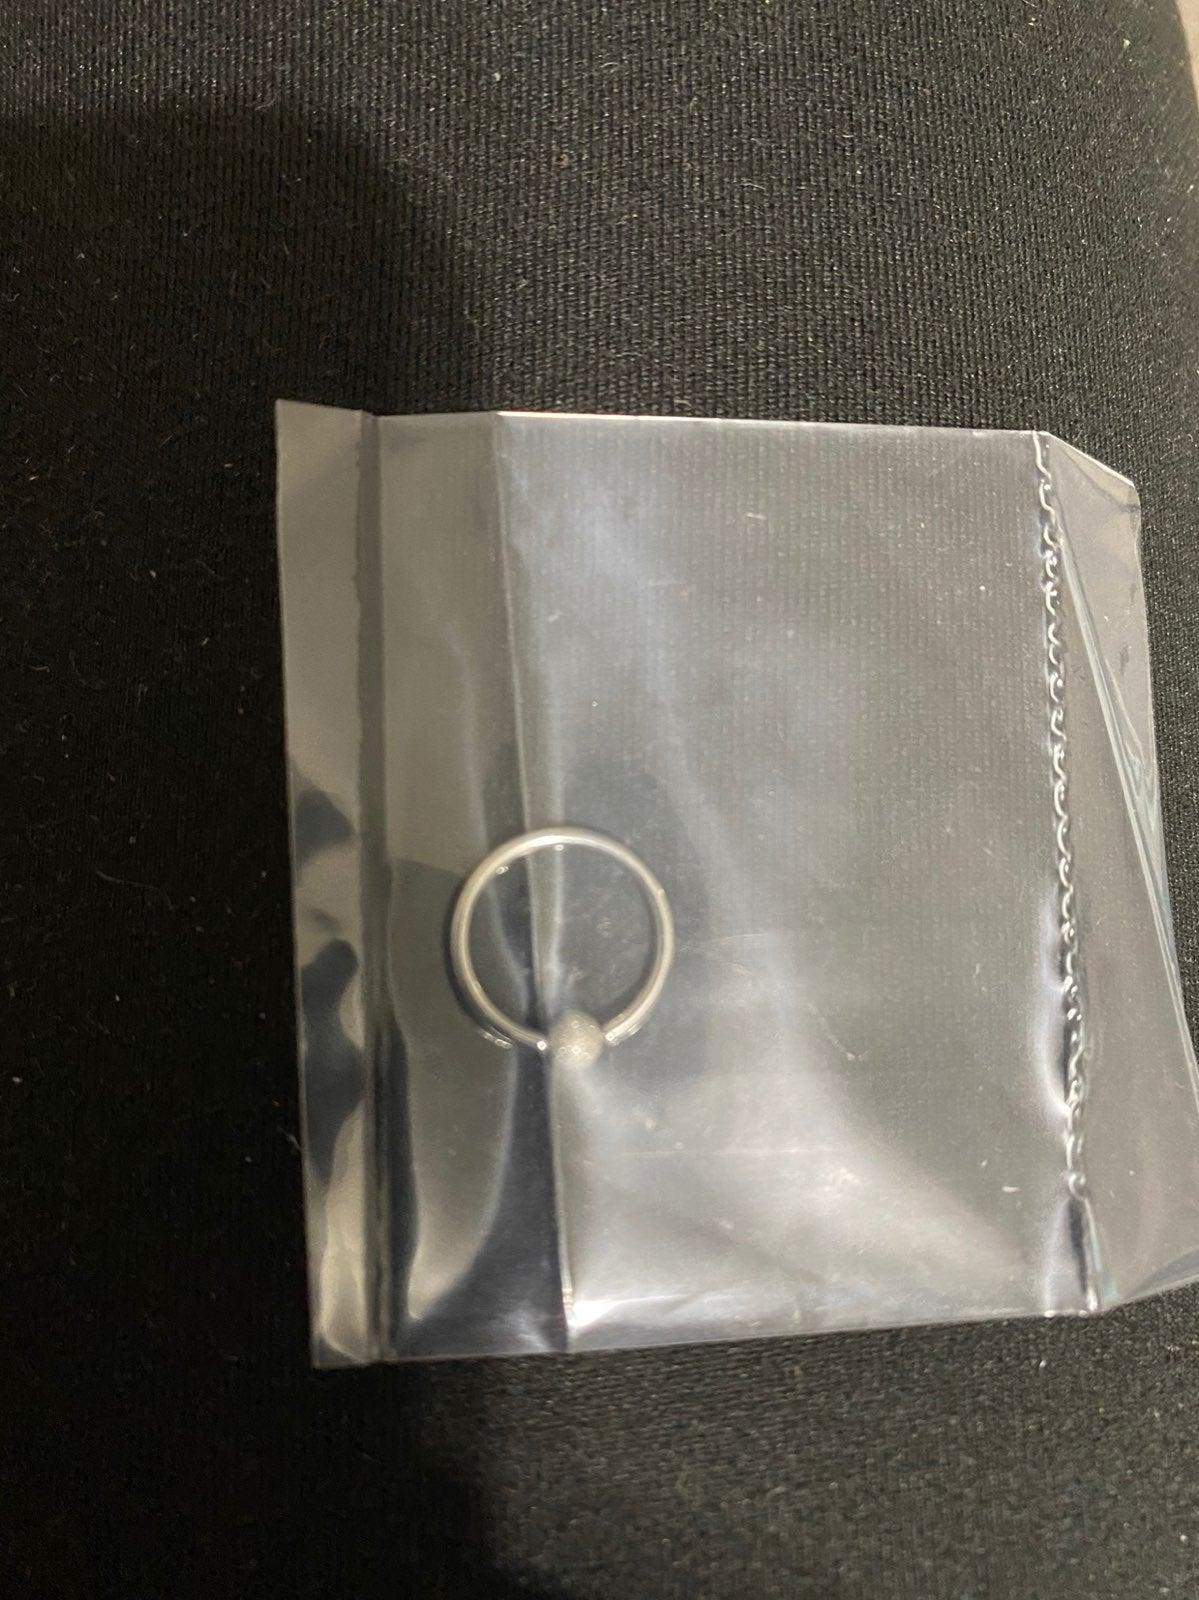 16 gauge eyebrow ring